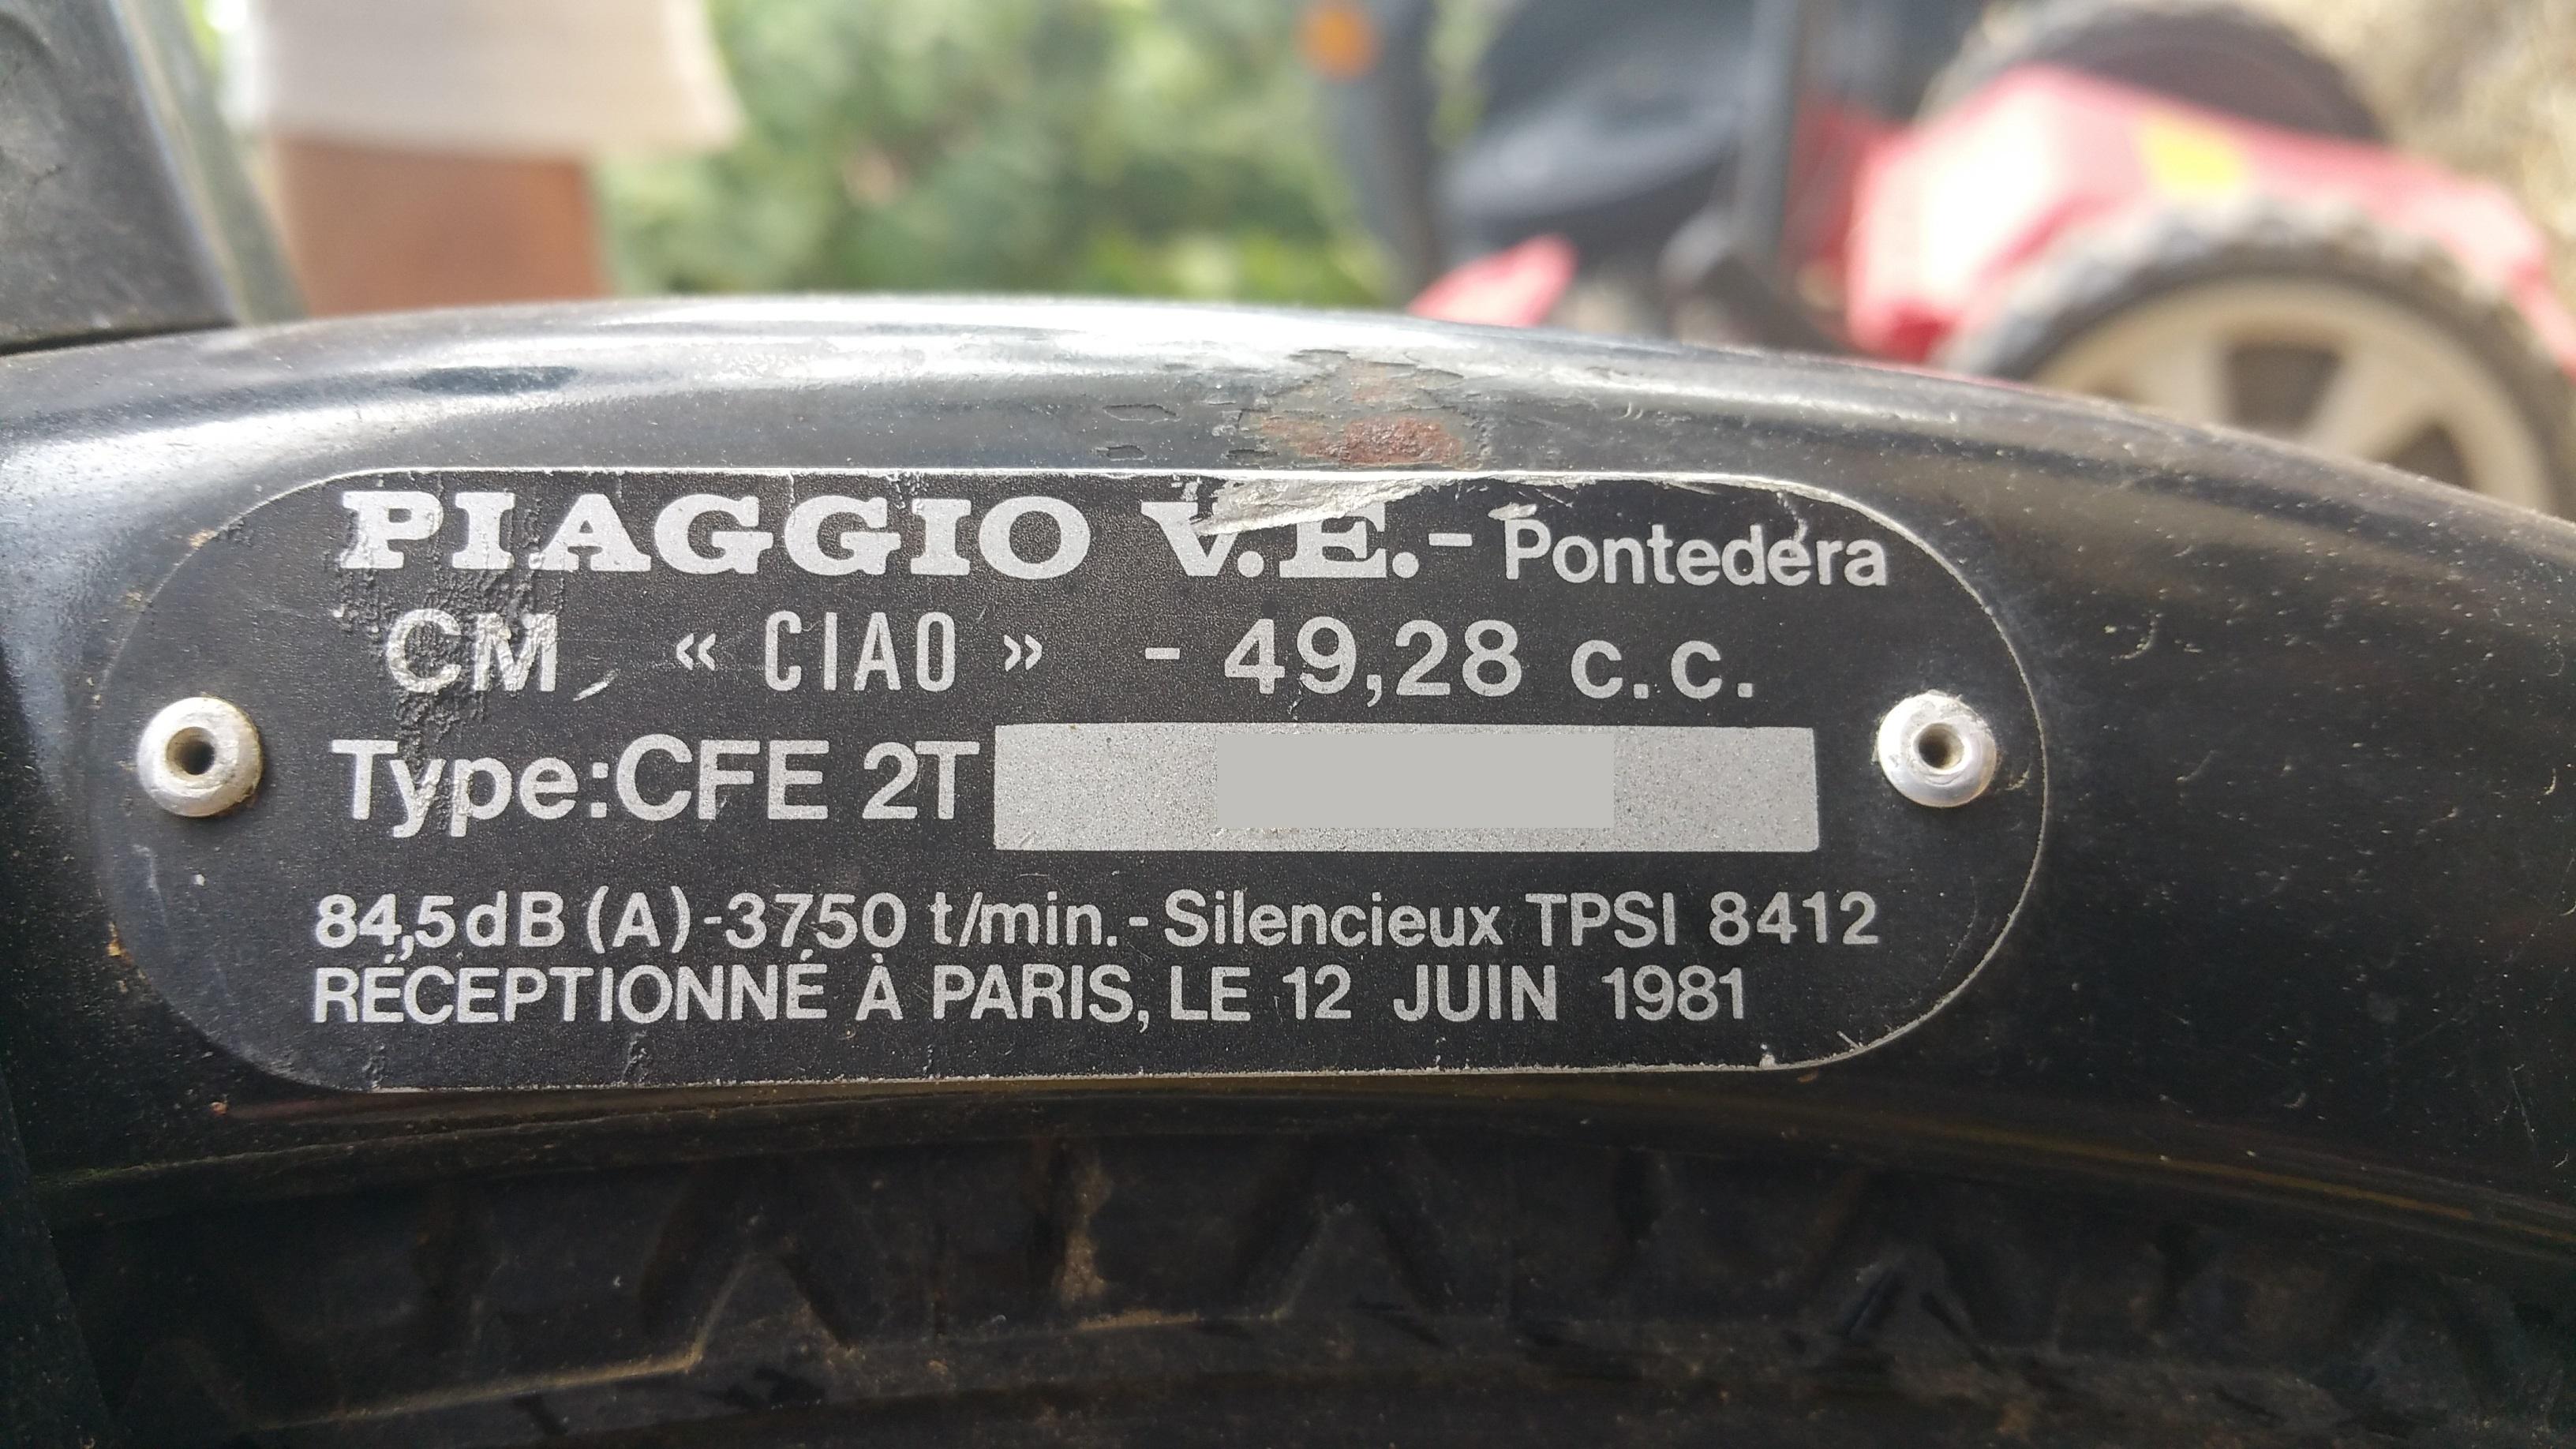 Restauration de mon Ciao CFE 2T de 1981 Classique. 16790820150903145219